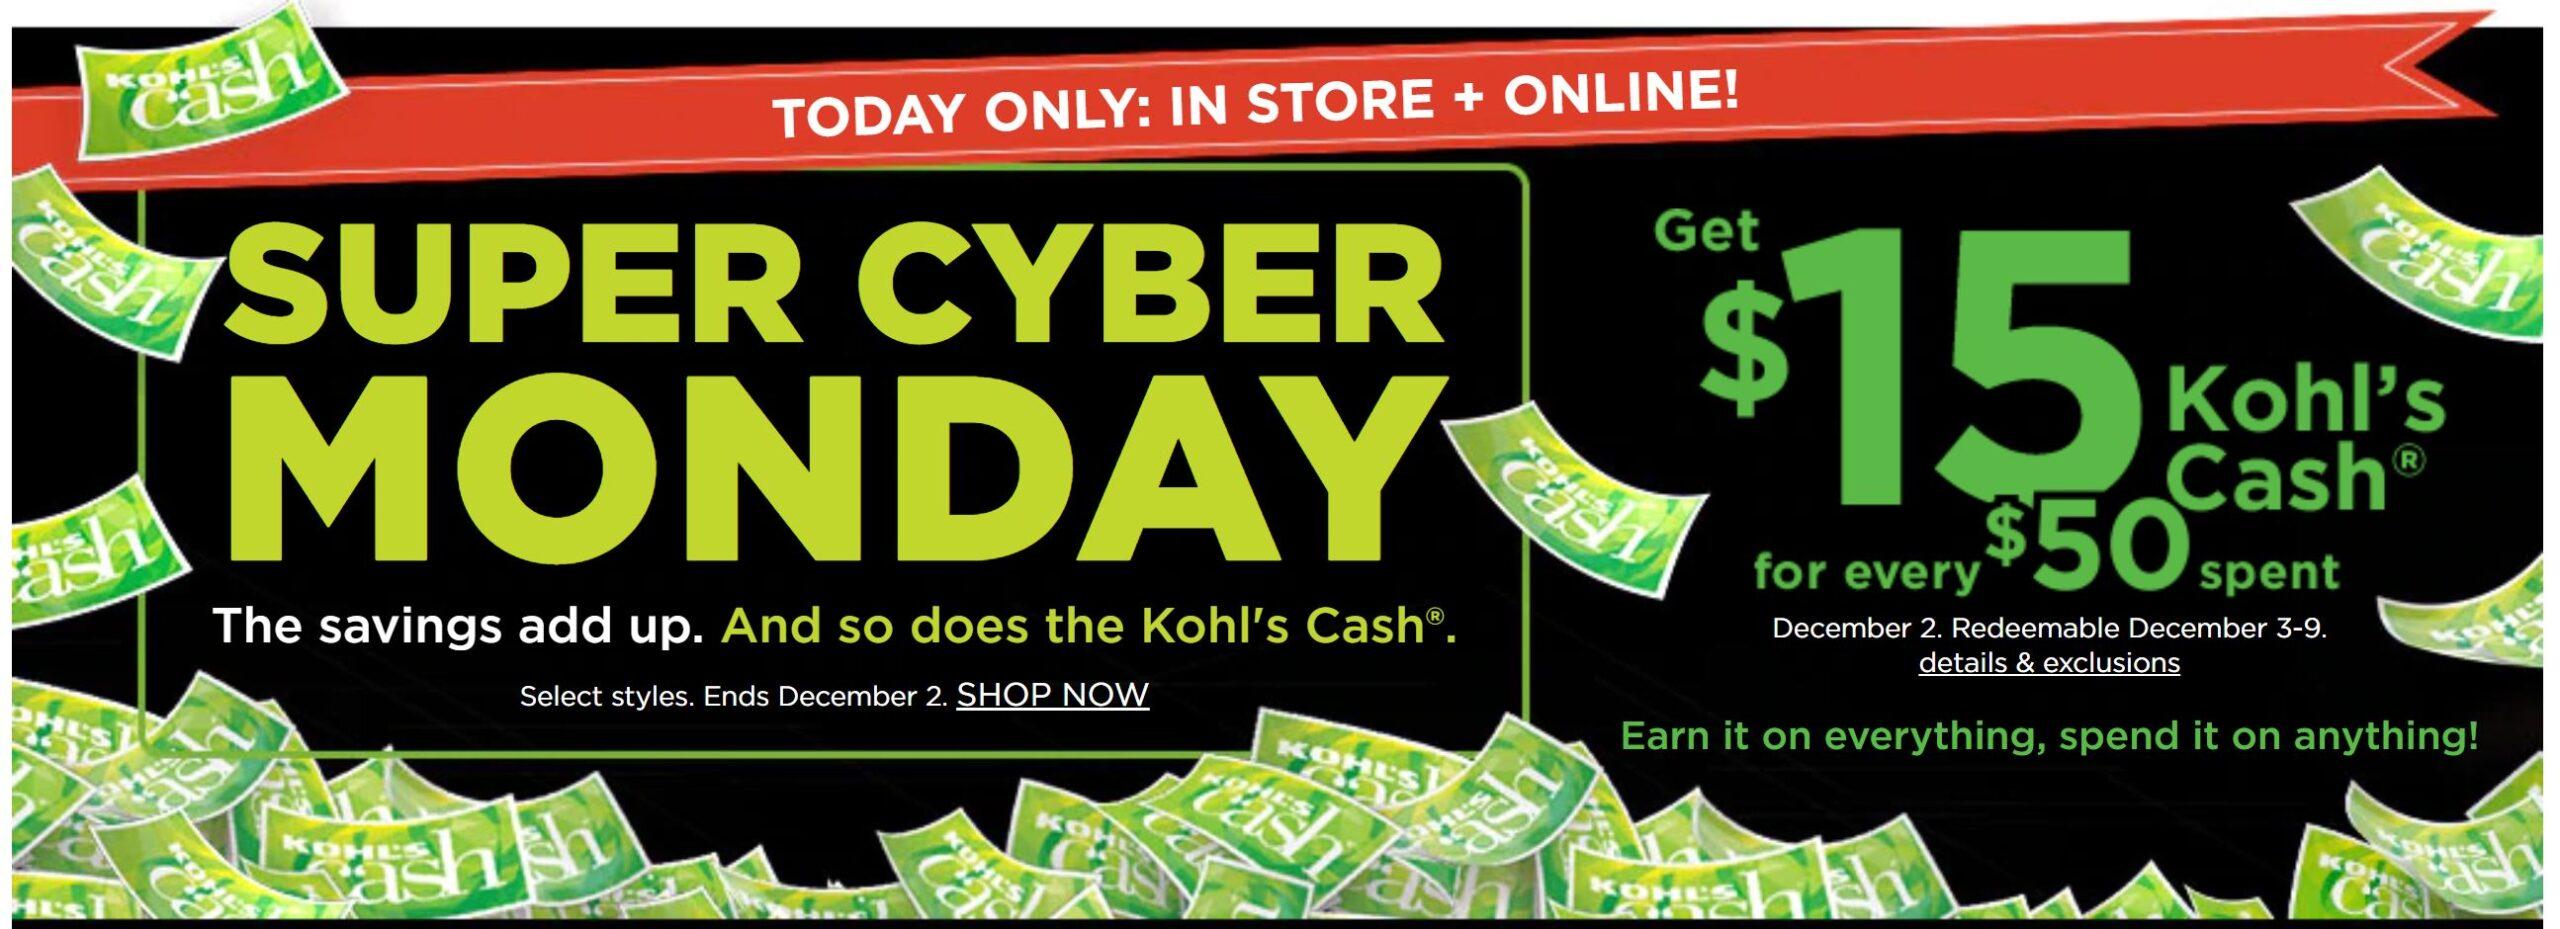 kohl's cyber monday sale